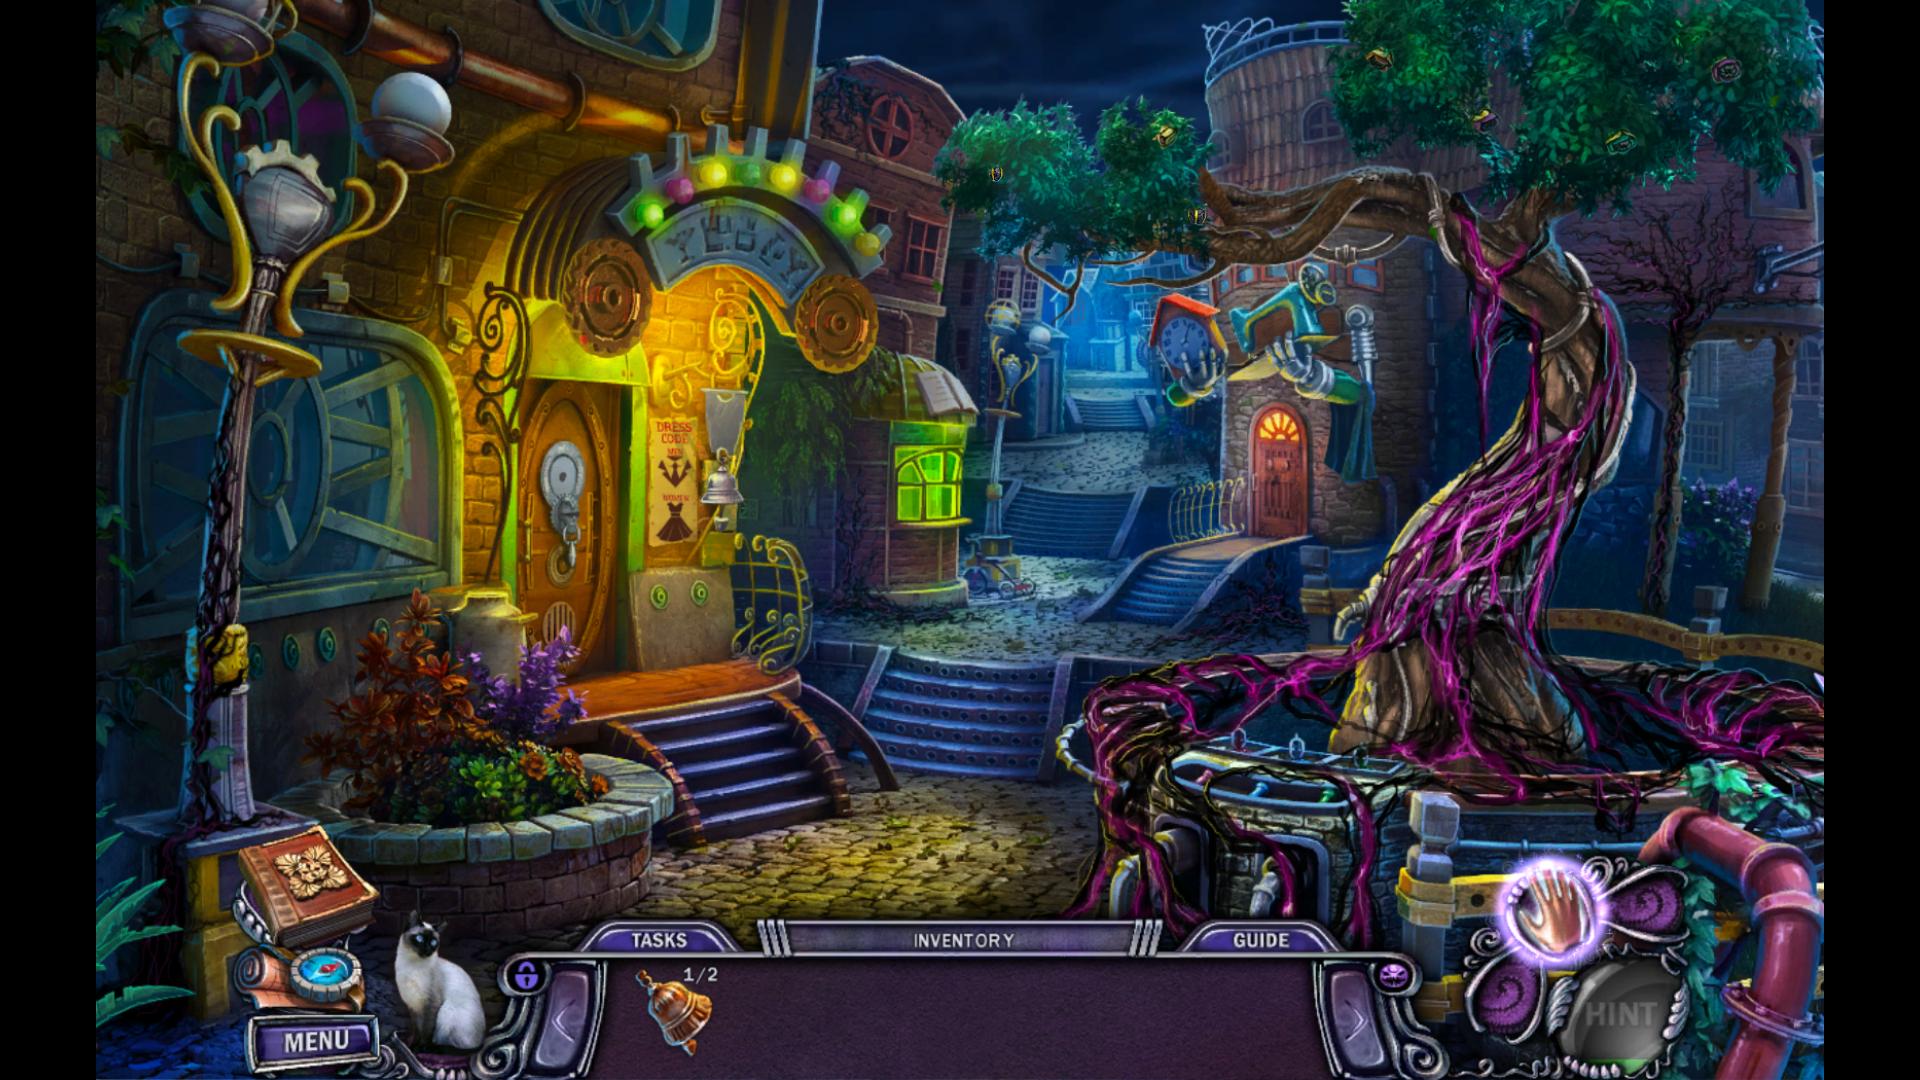 Screenshot from House of 1000 Doors: Evil Inside (7/9)